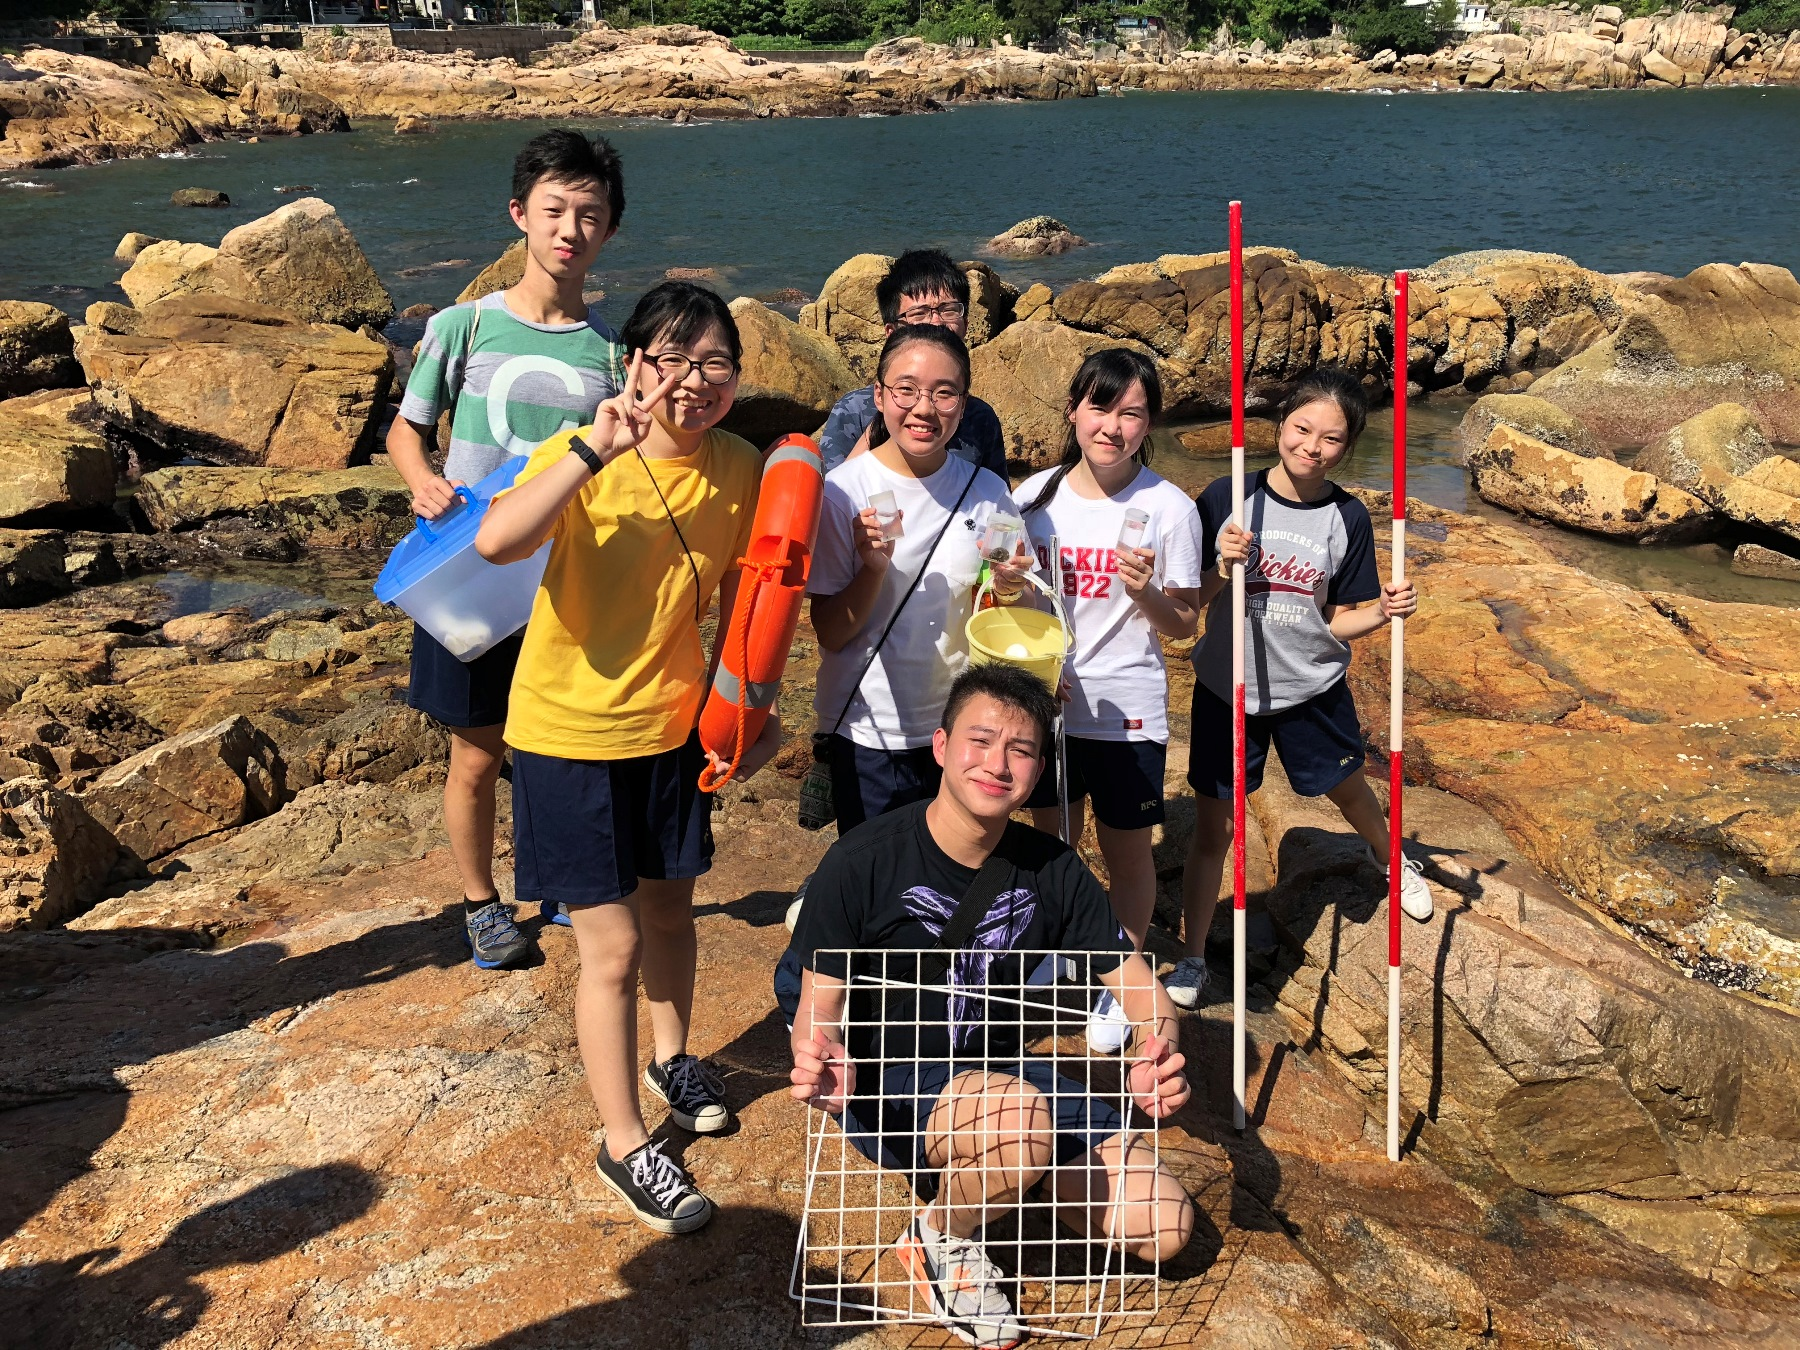 http://www.npc.edu.hk/sites/default/files/15_108.jpg